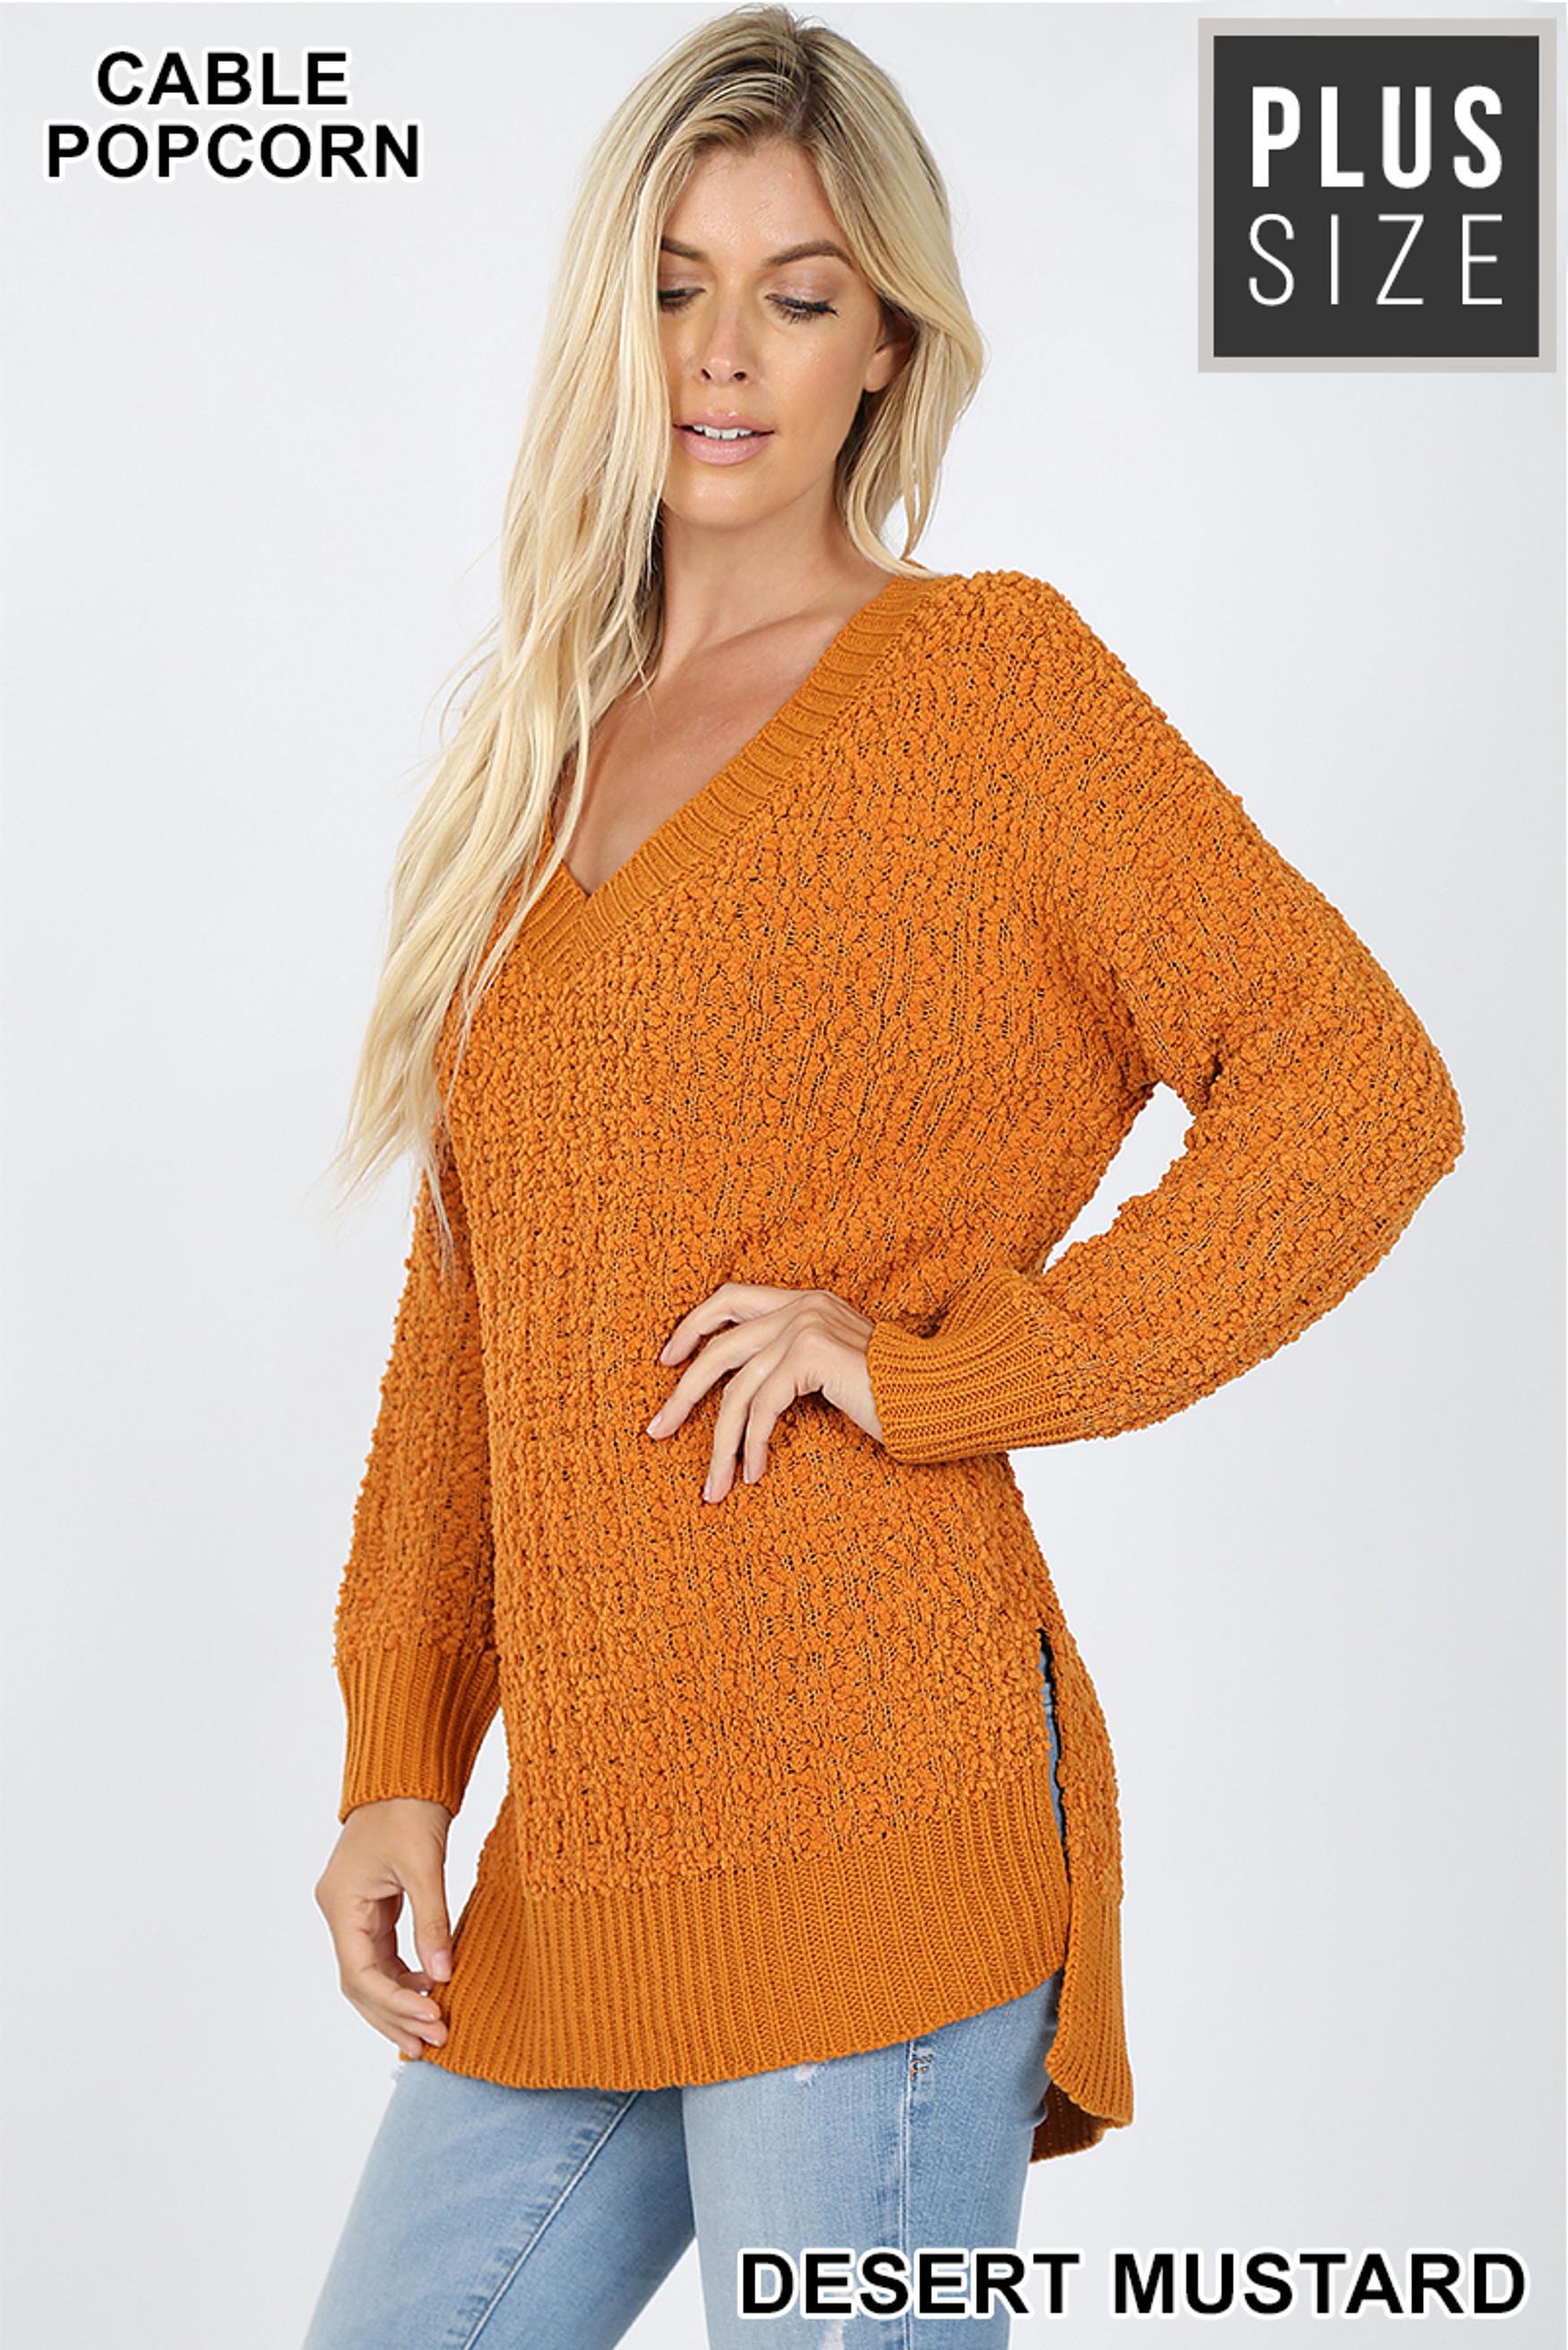 45 degree image of Desert Mustard Cable Knit Popcorn V-Neck Hi-Low Plus Size Sweater